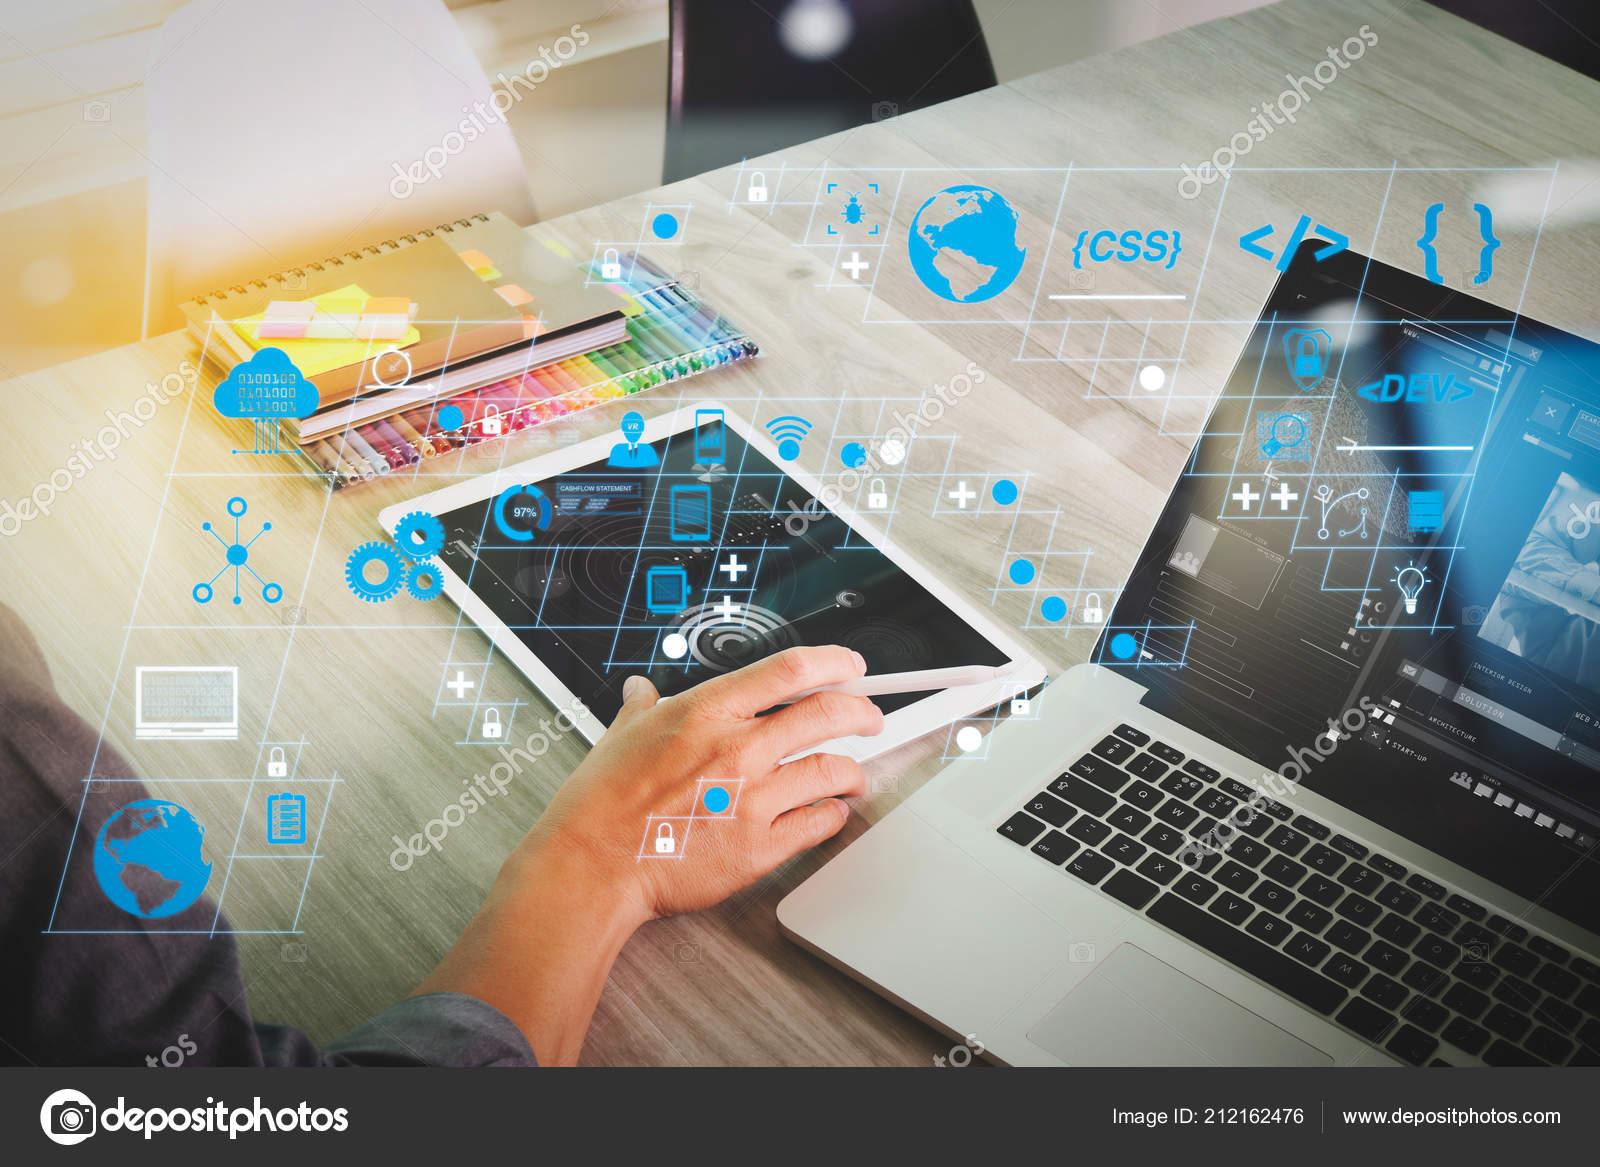 Coding Software Developer Work New Design Dashboard Computer Icons Scrum Stock Photo C Everythingposs 212162476